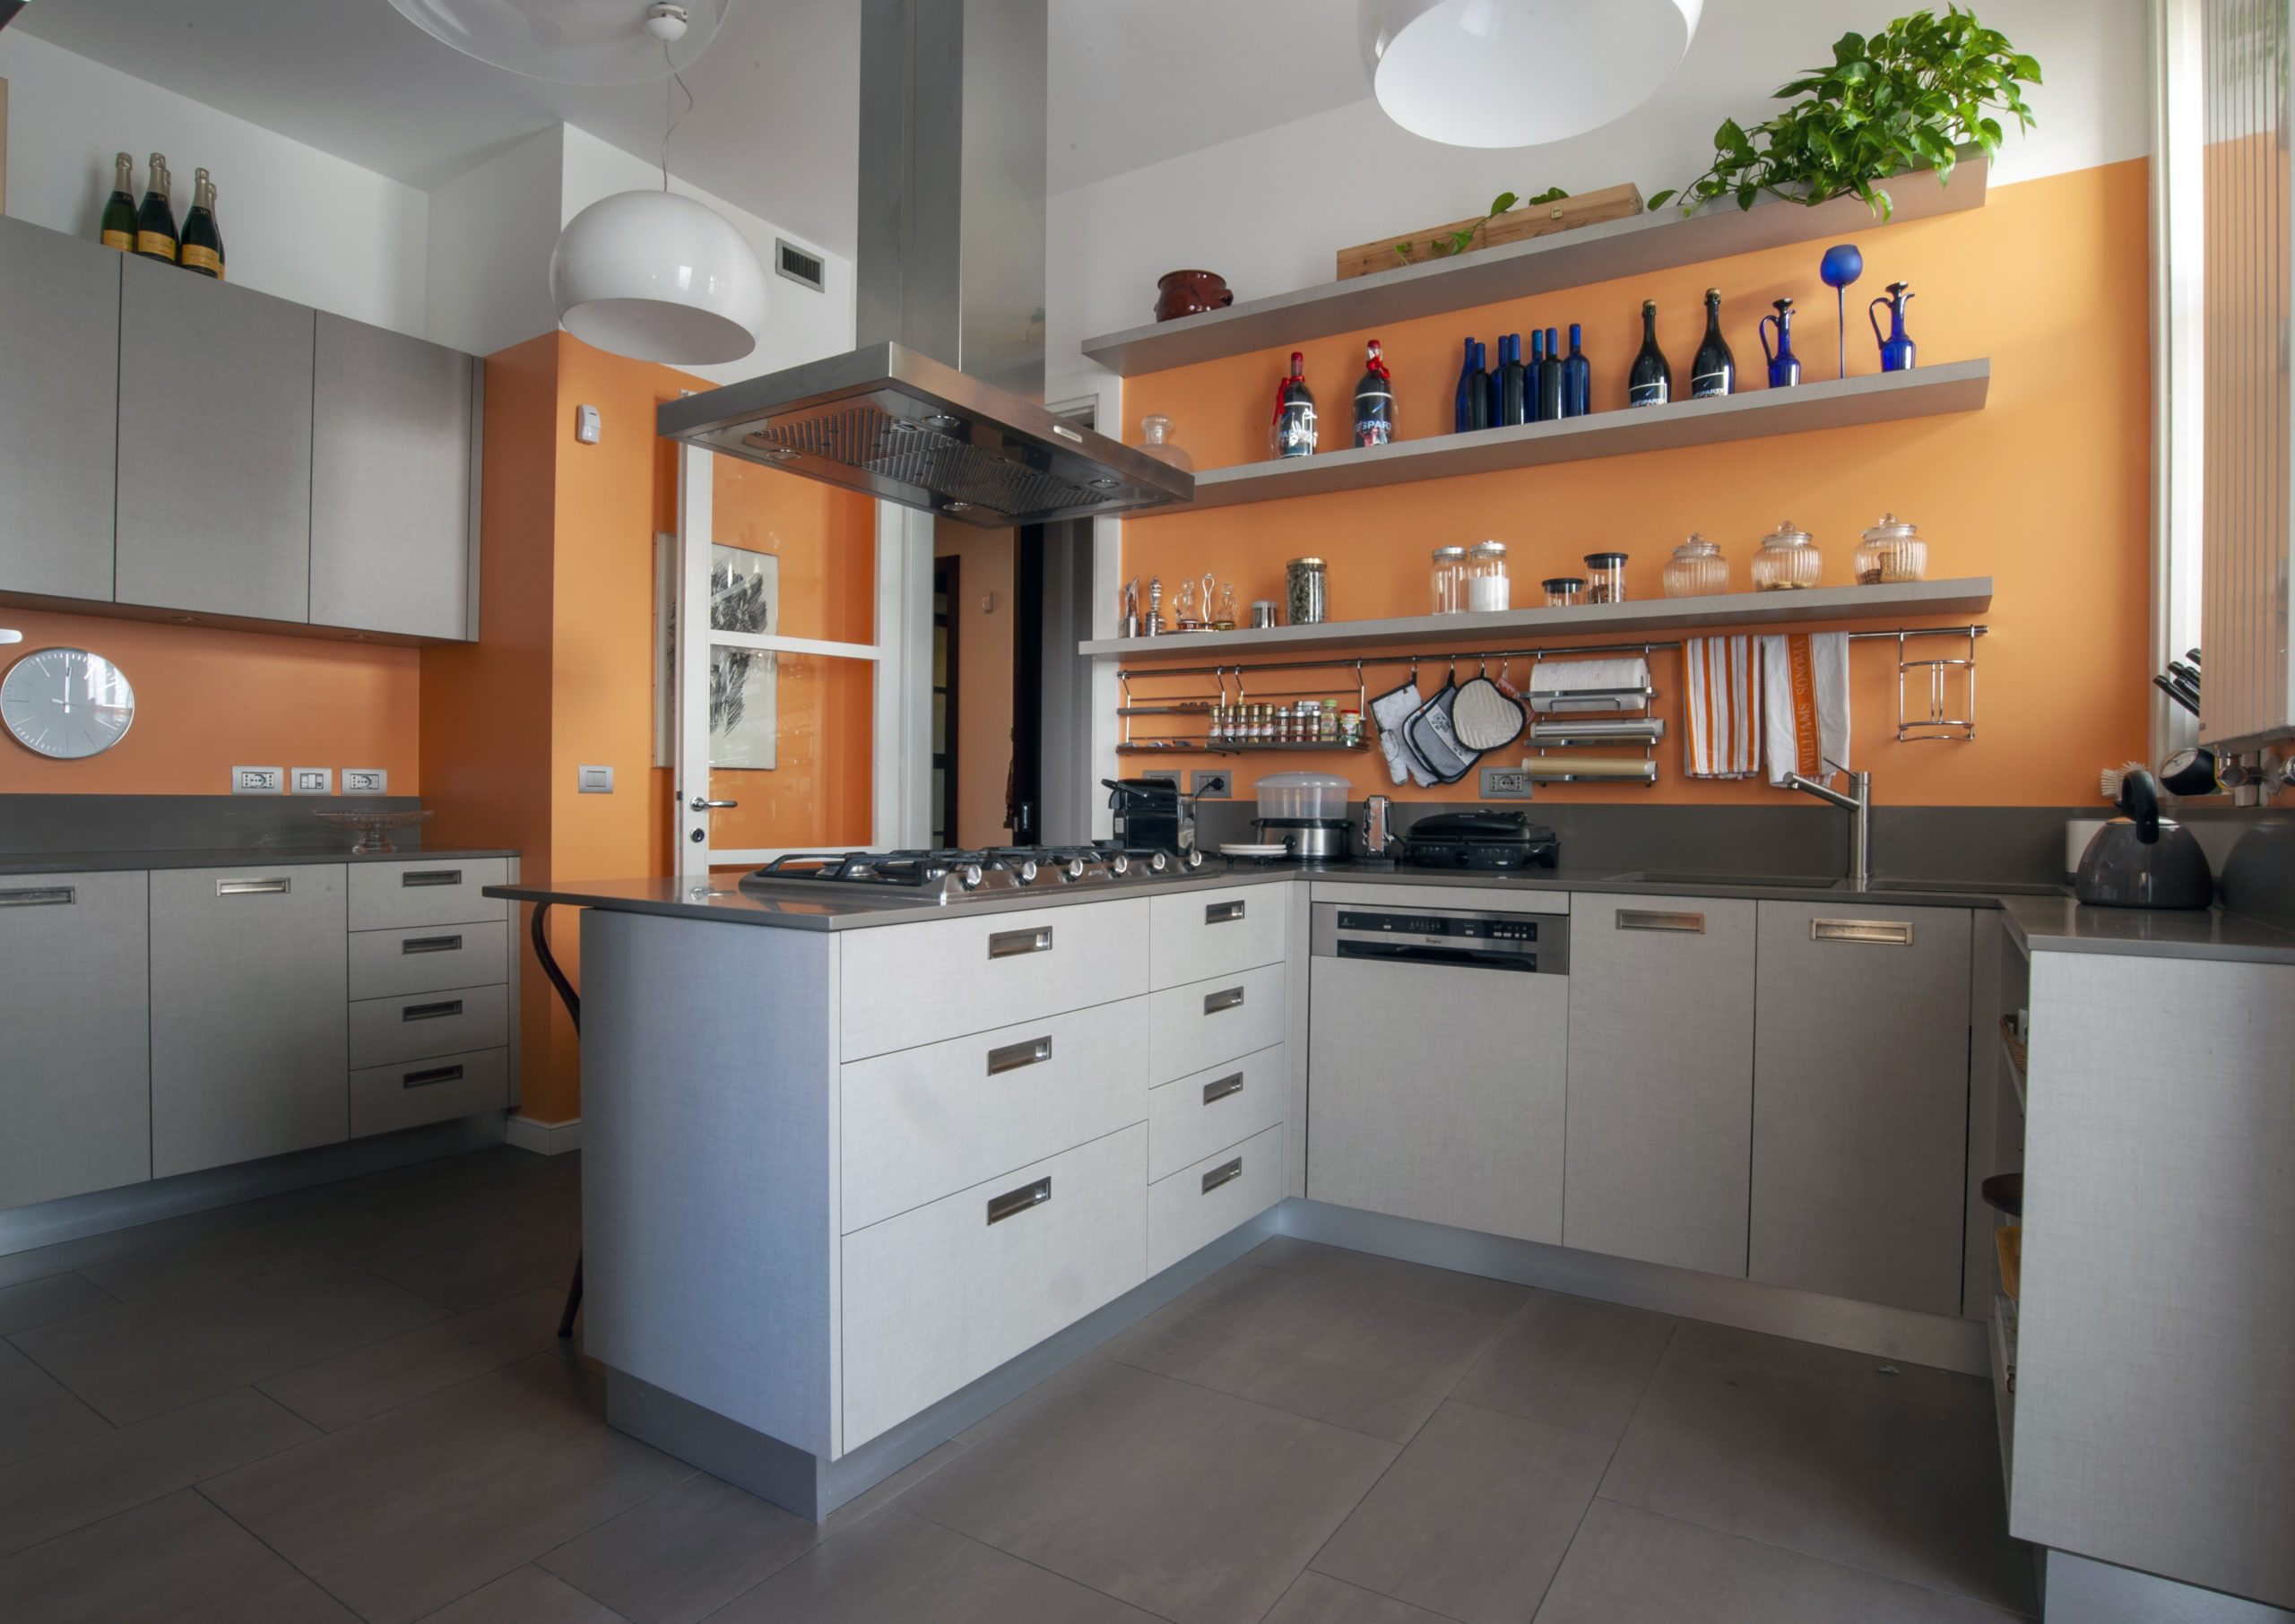 011-cucina